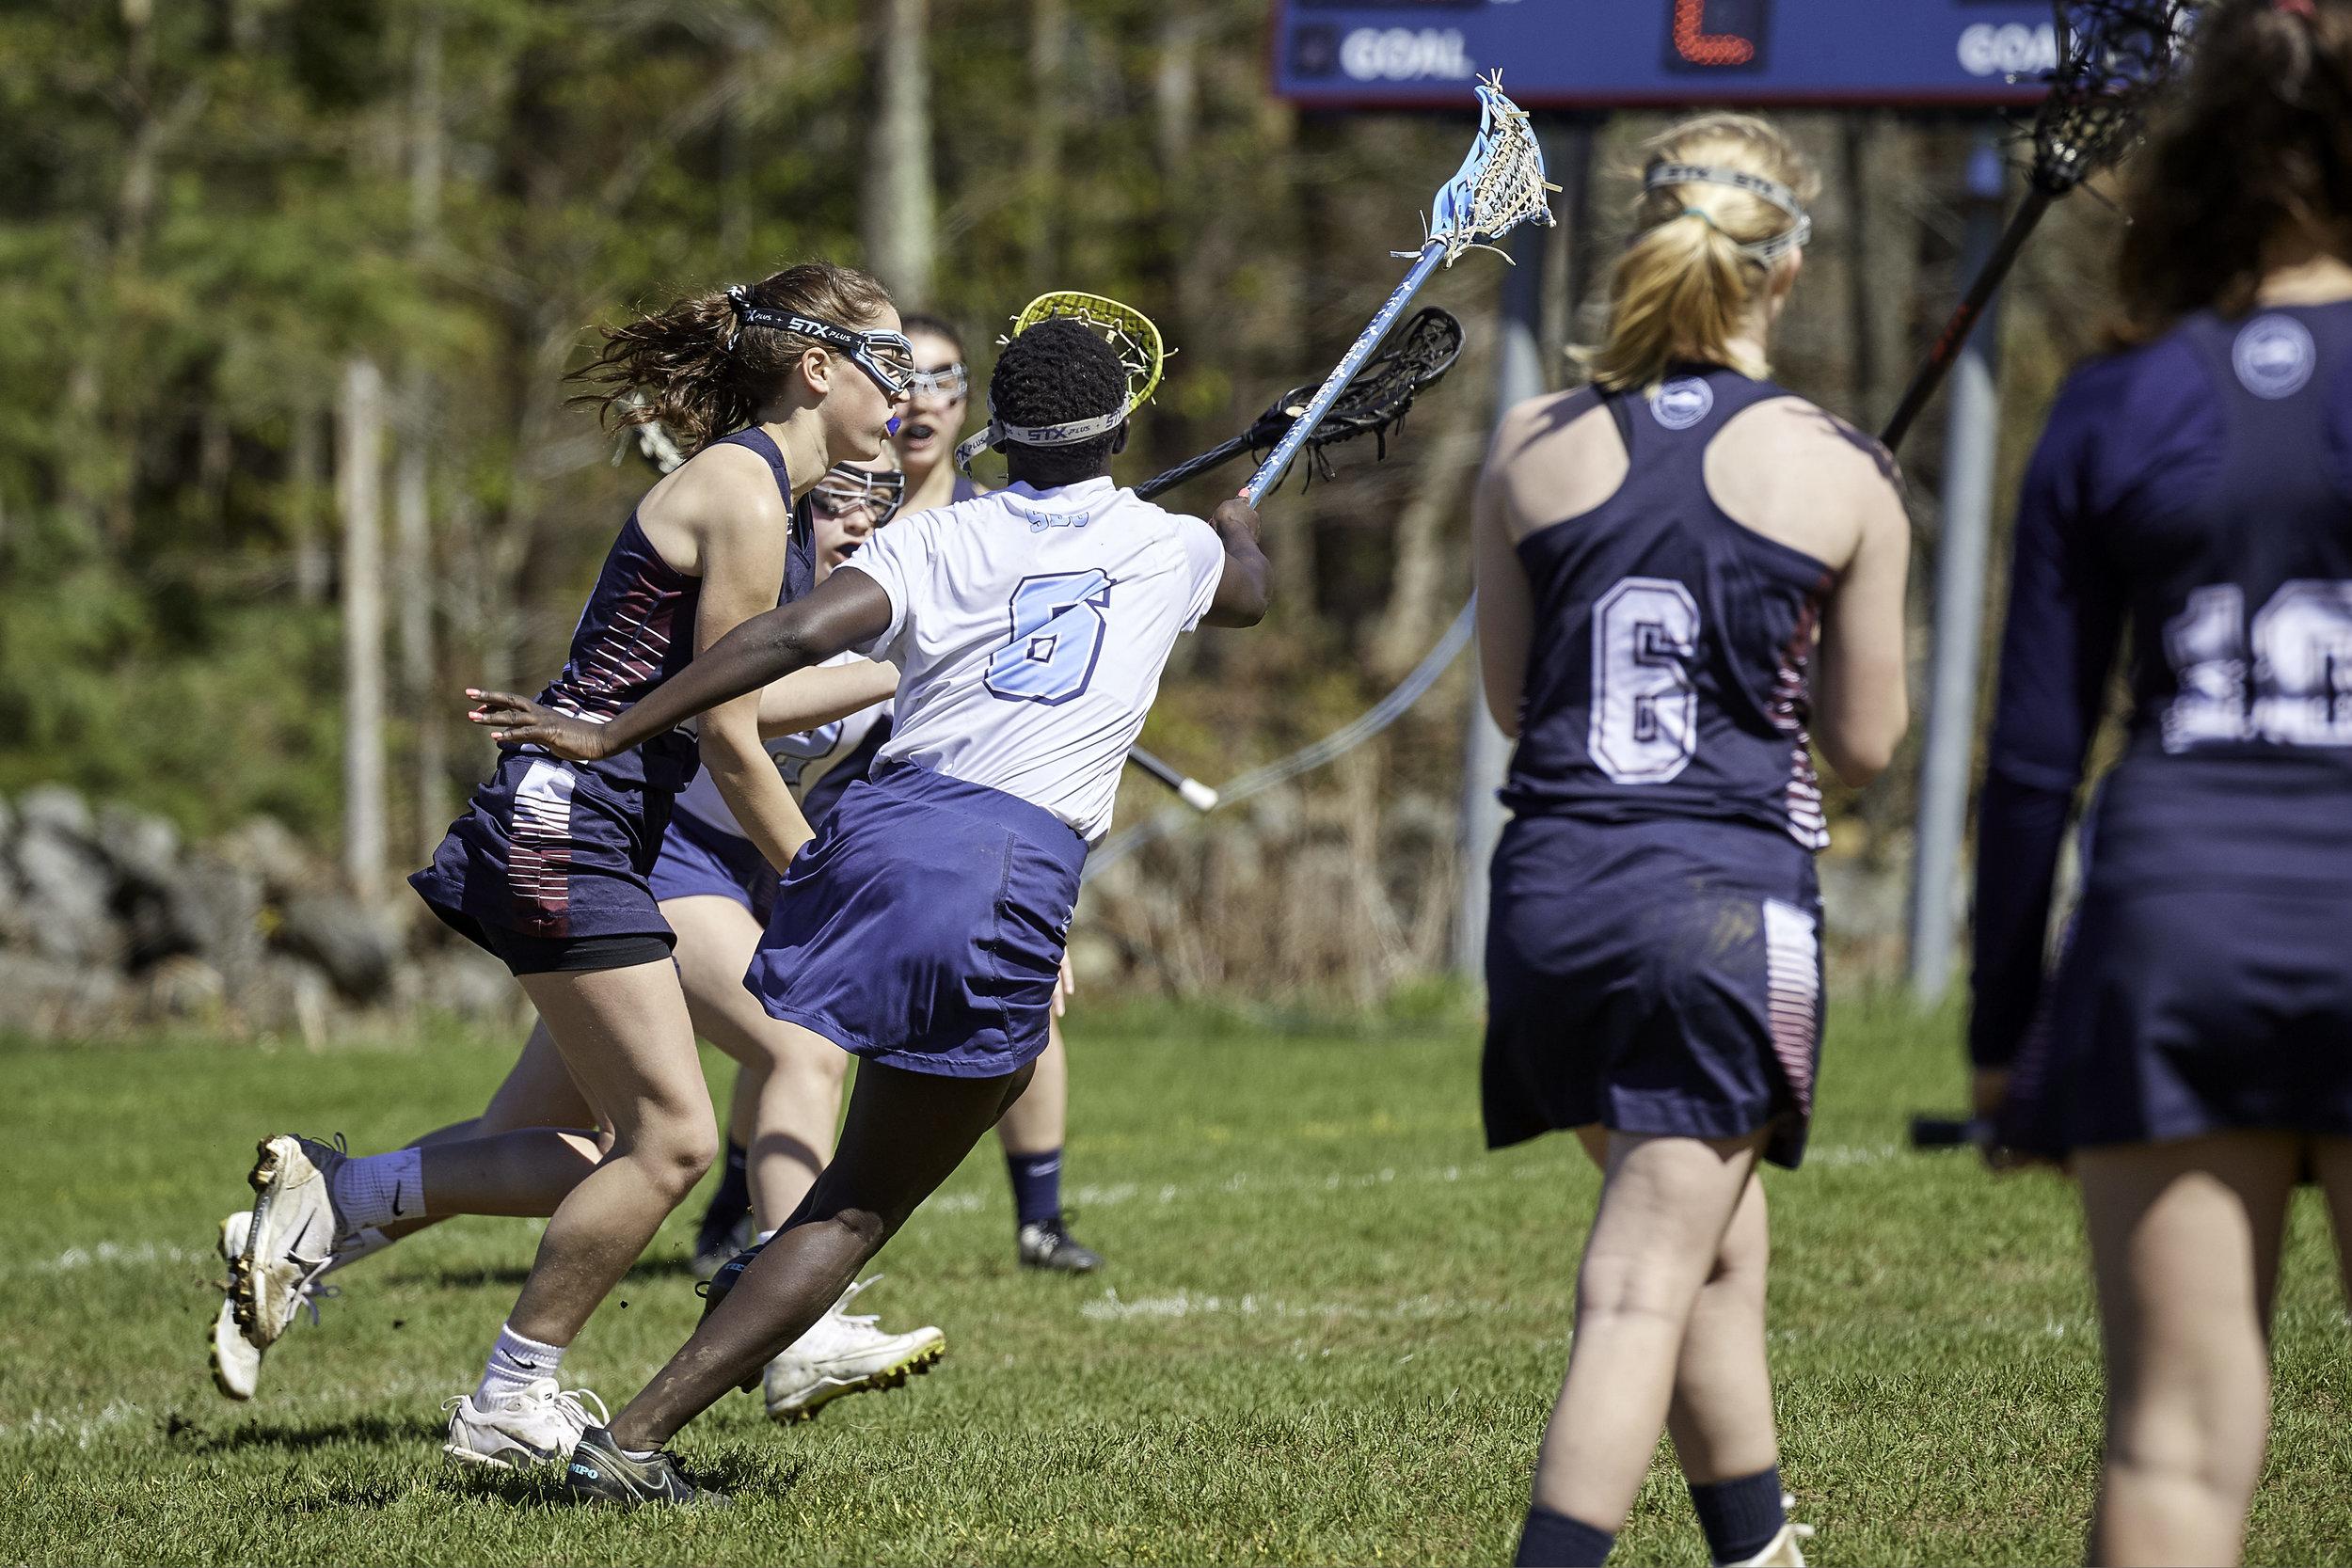 Girls Lacrosse vs. Stoneleigh Burnham School - May 11, 2019 - May 10, 2019193453.jpg